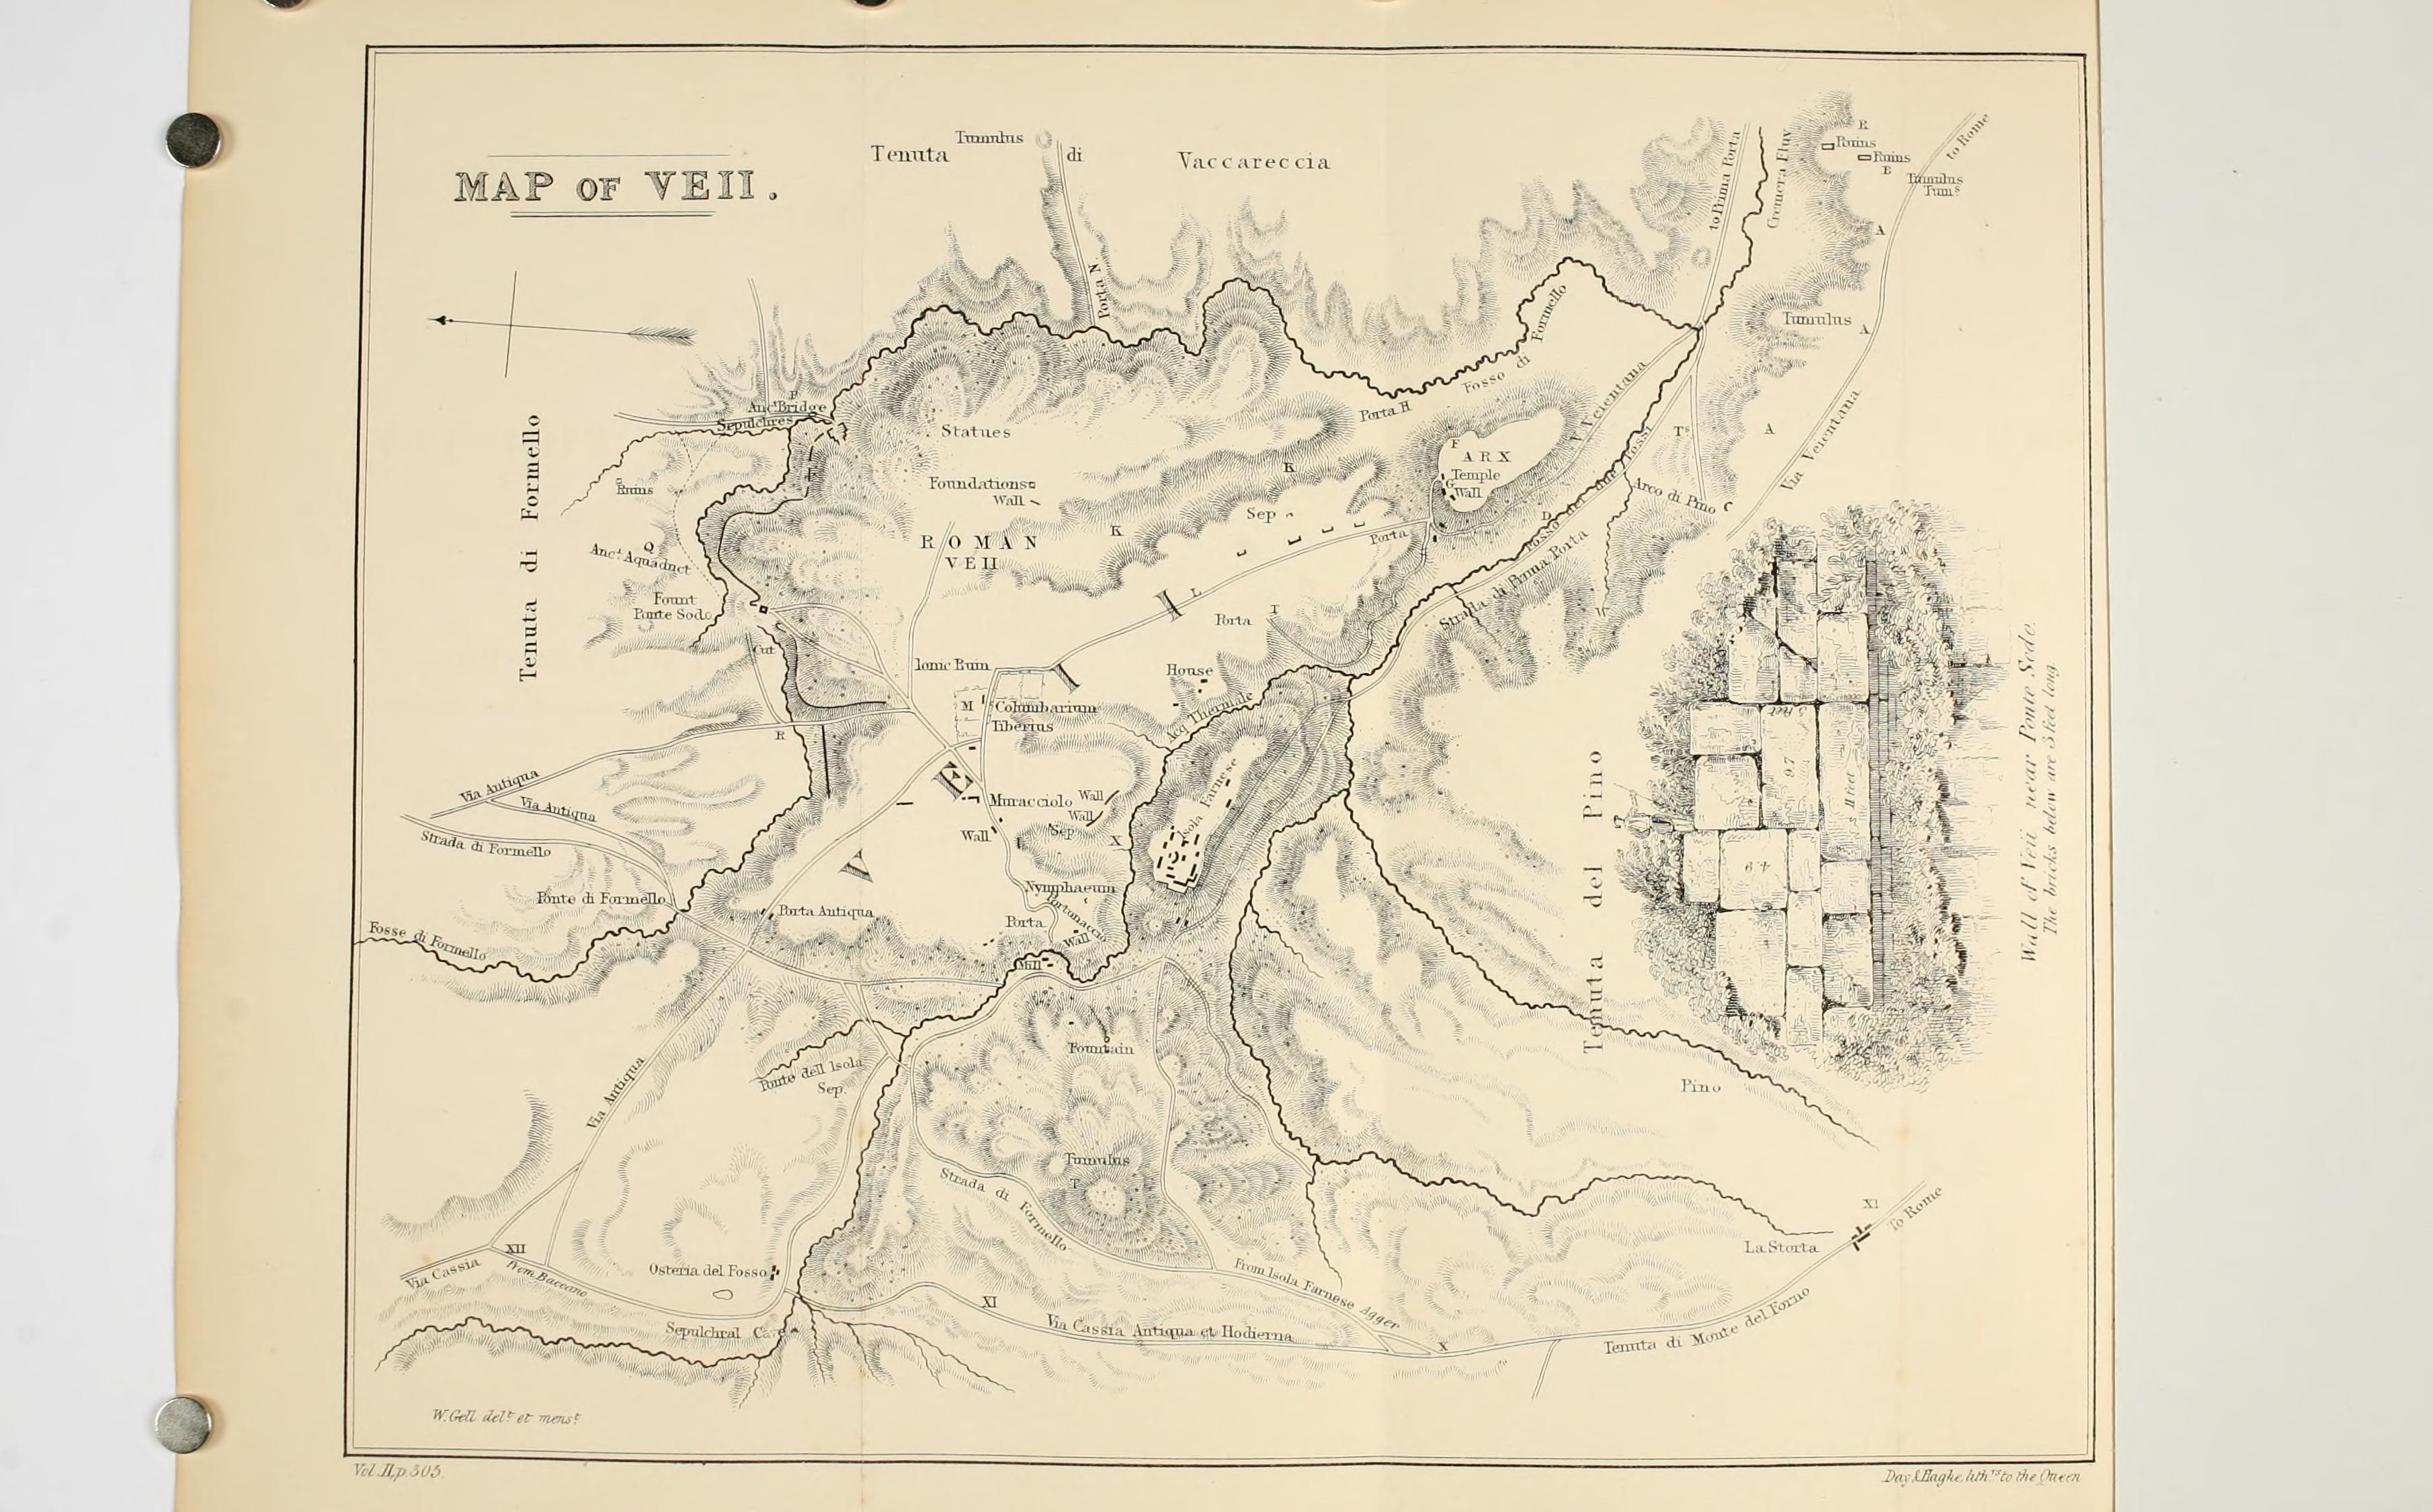 File Veio Mappa Gell Jpg Wikipedia